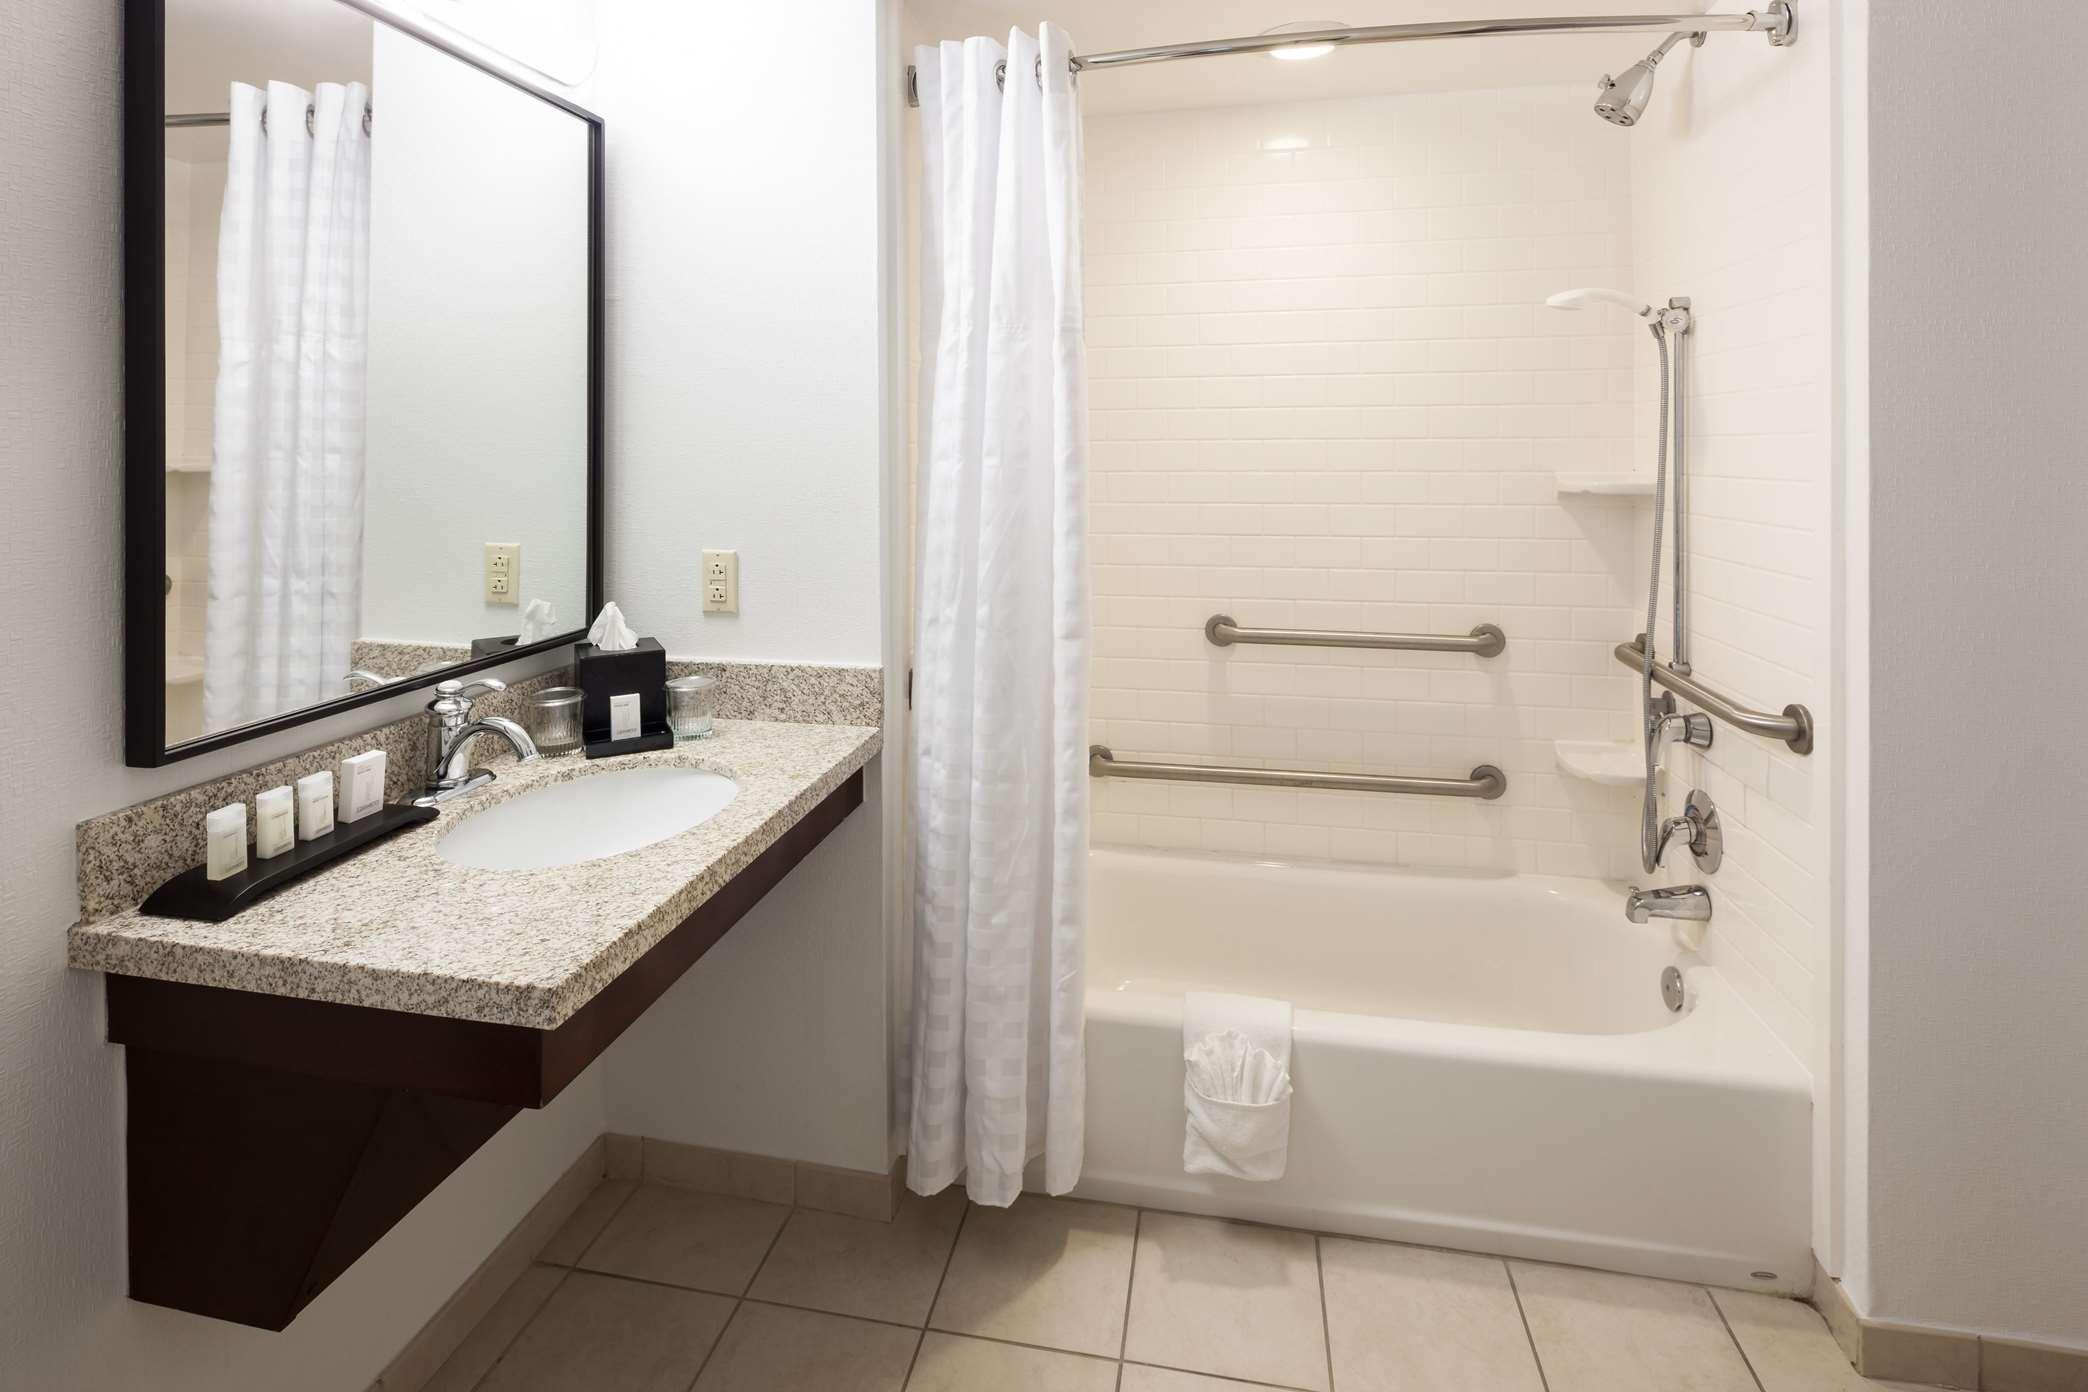 Embassy Suites by Hilton Tampa Brandon image 12